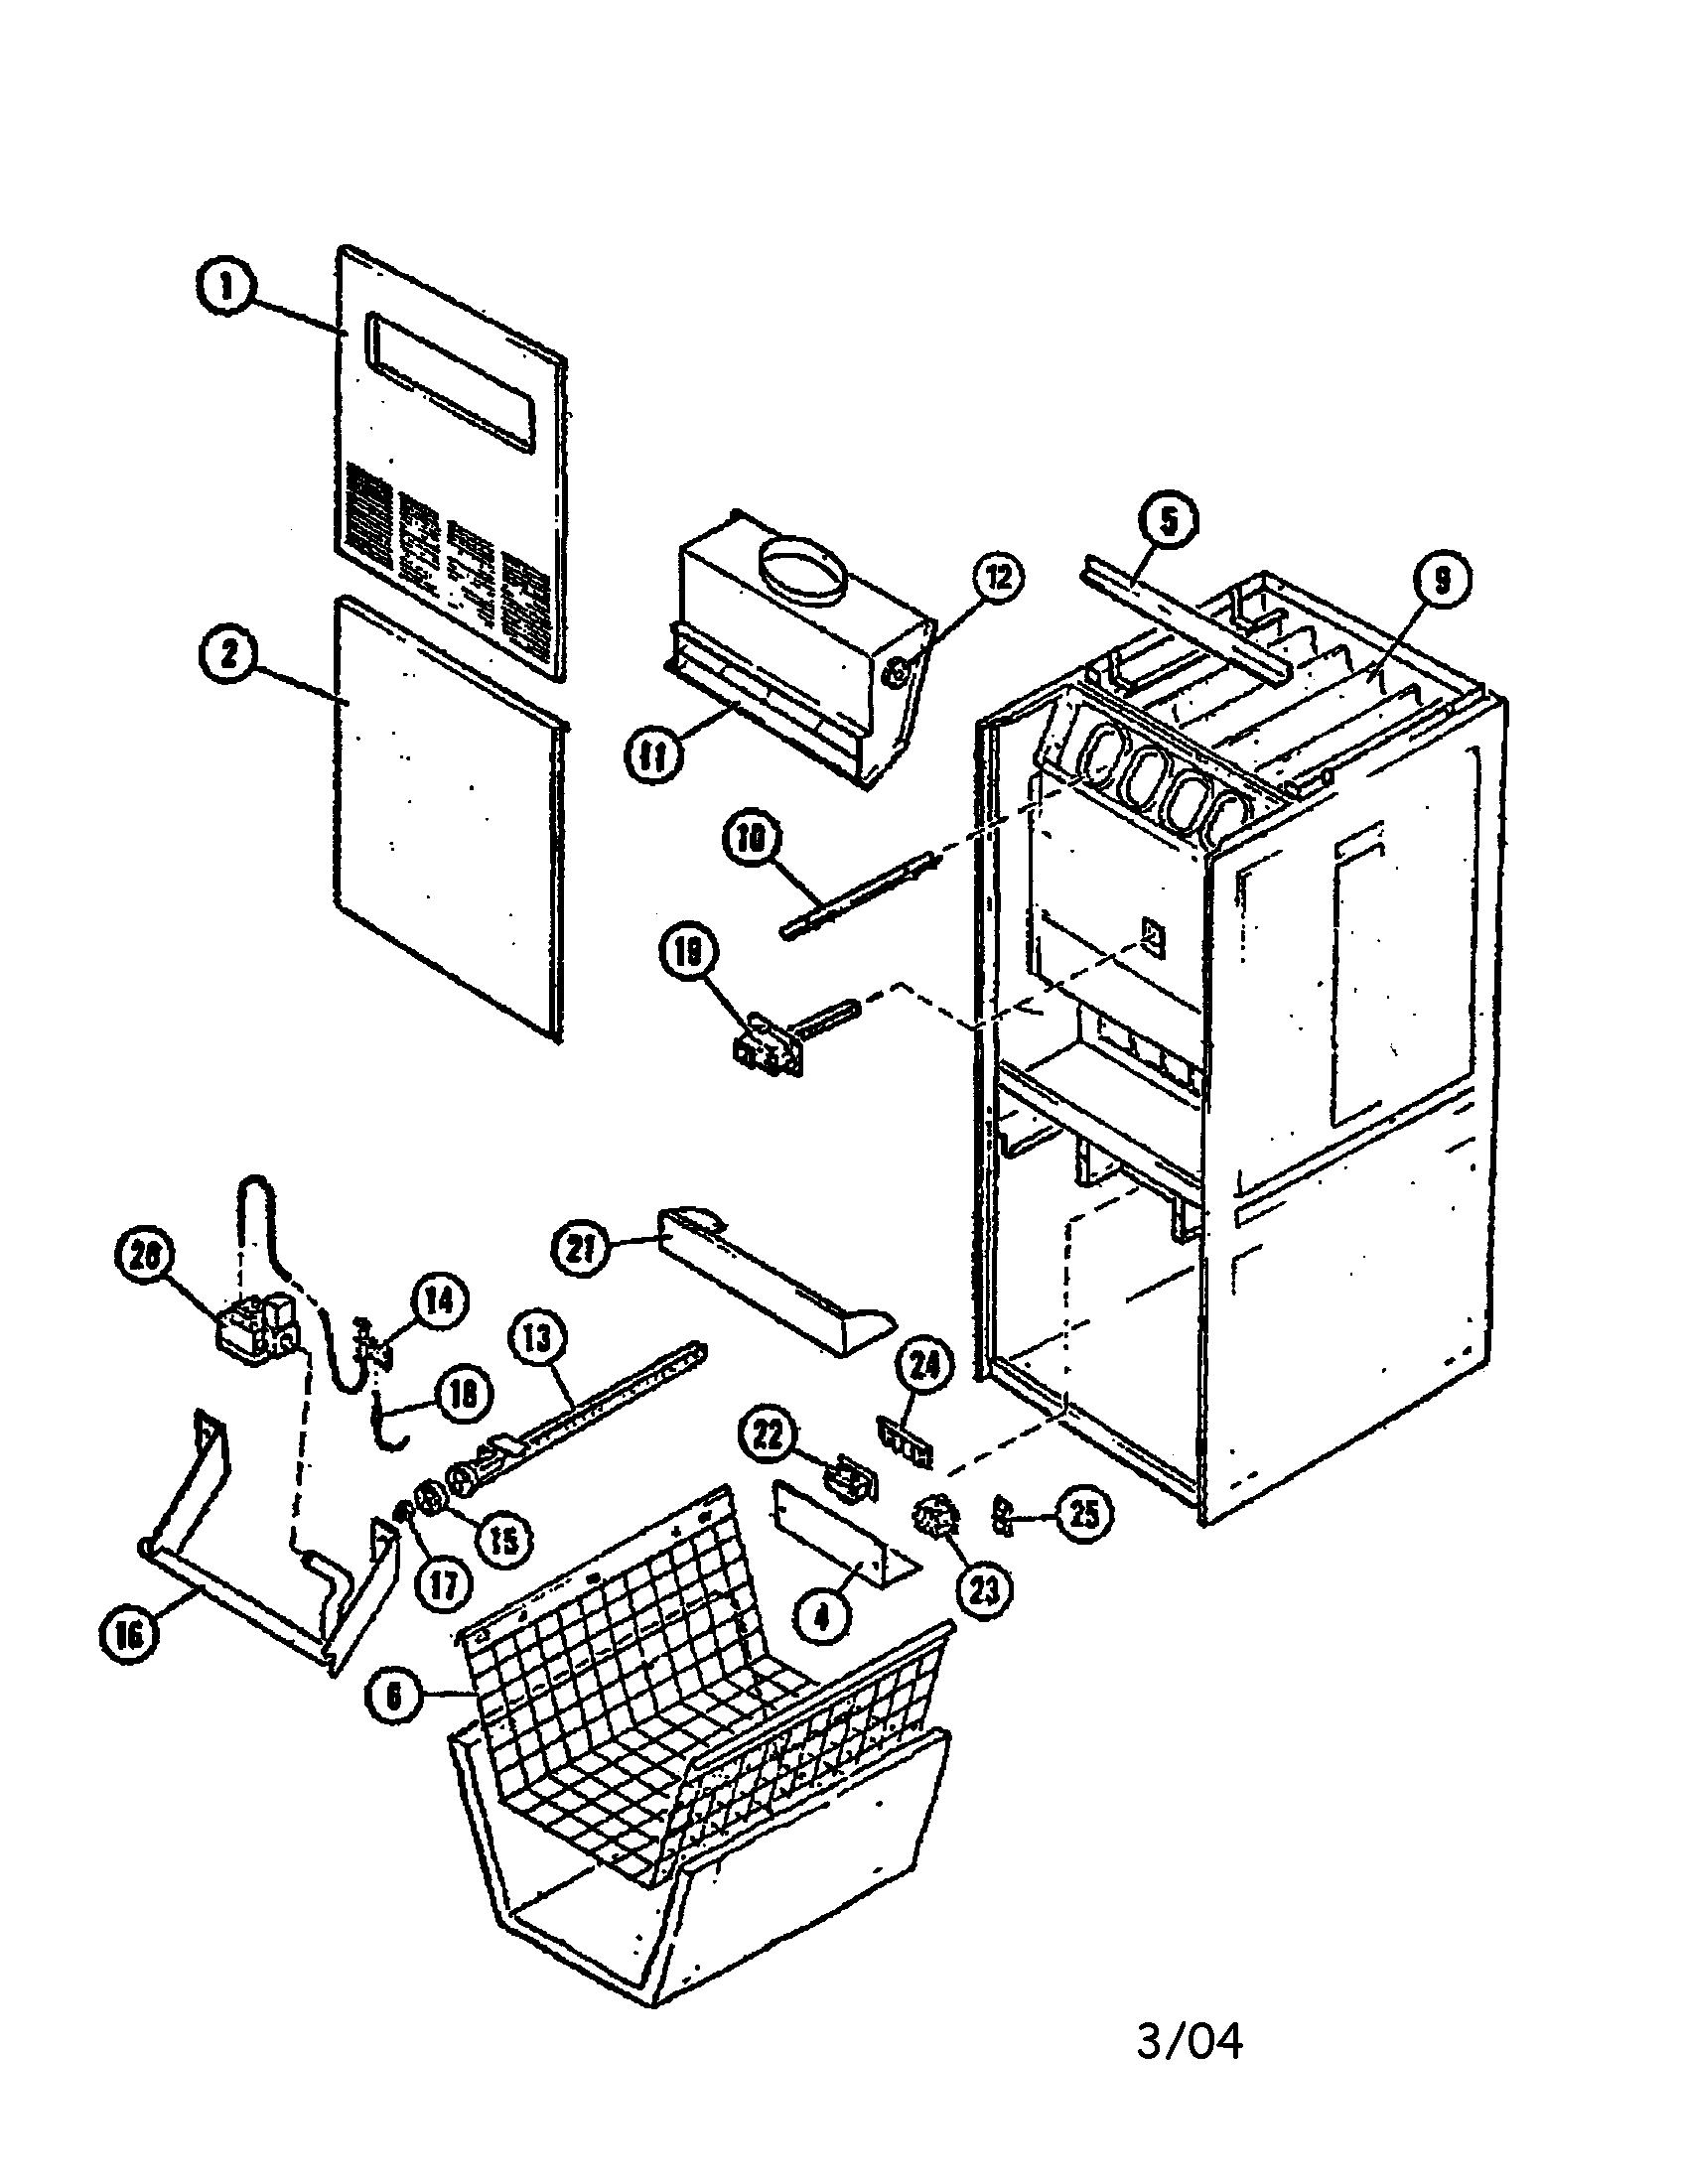 lennox air conditioner wiring diagram co 3338  unit diagram parts list for model g12827 lennoxparts  parts list for model g12827 lennoxparts